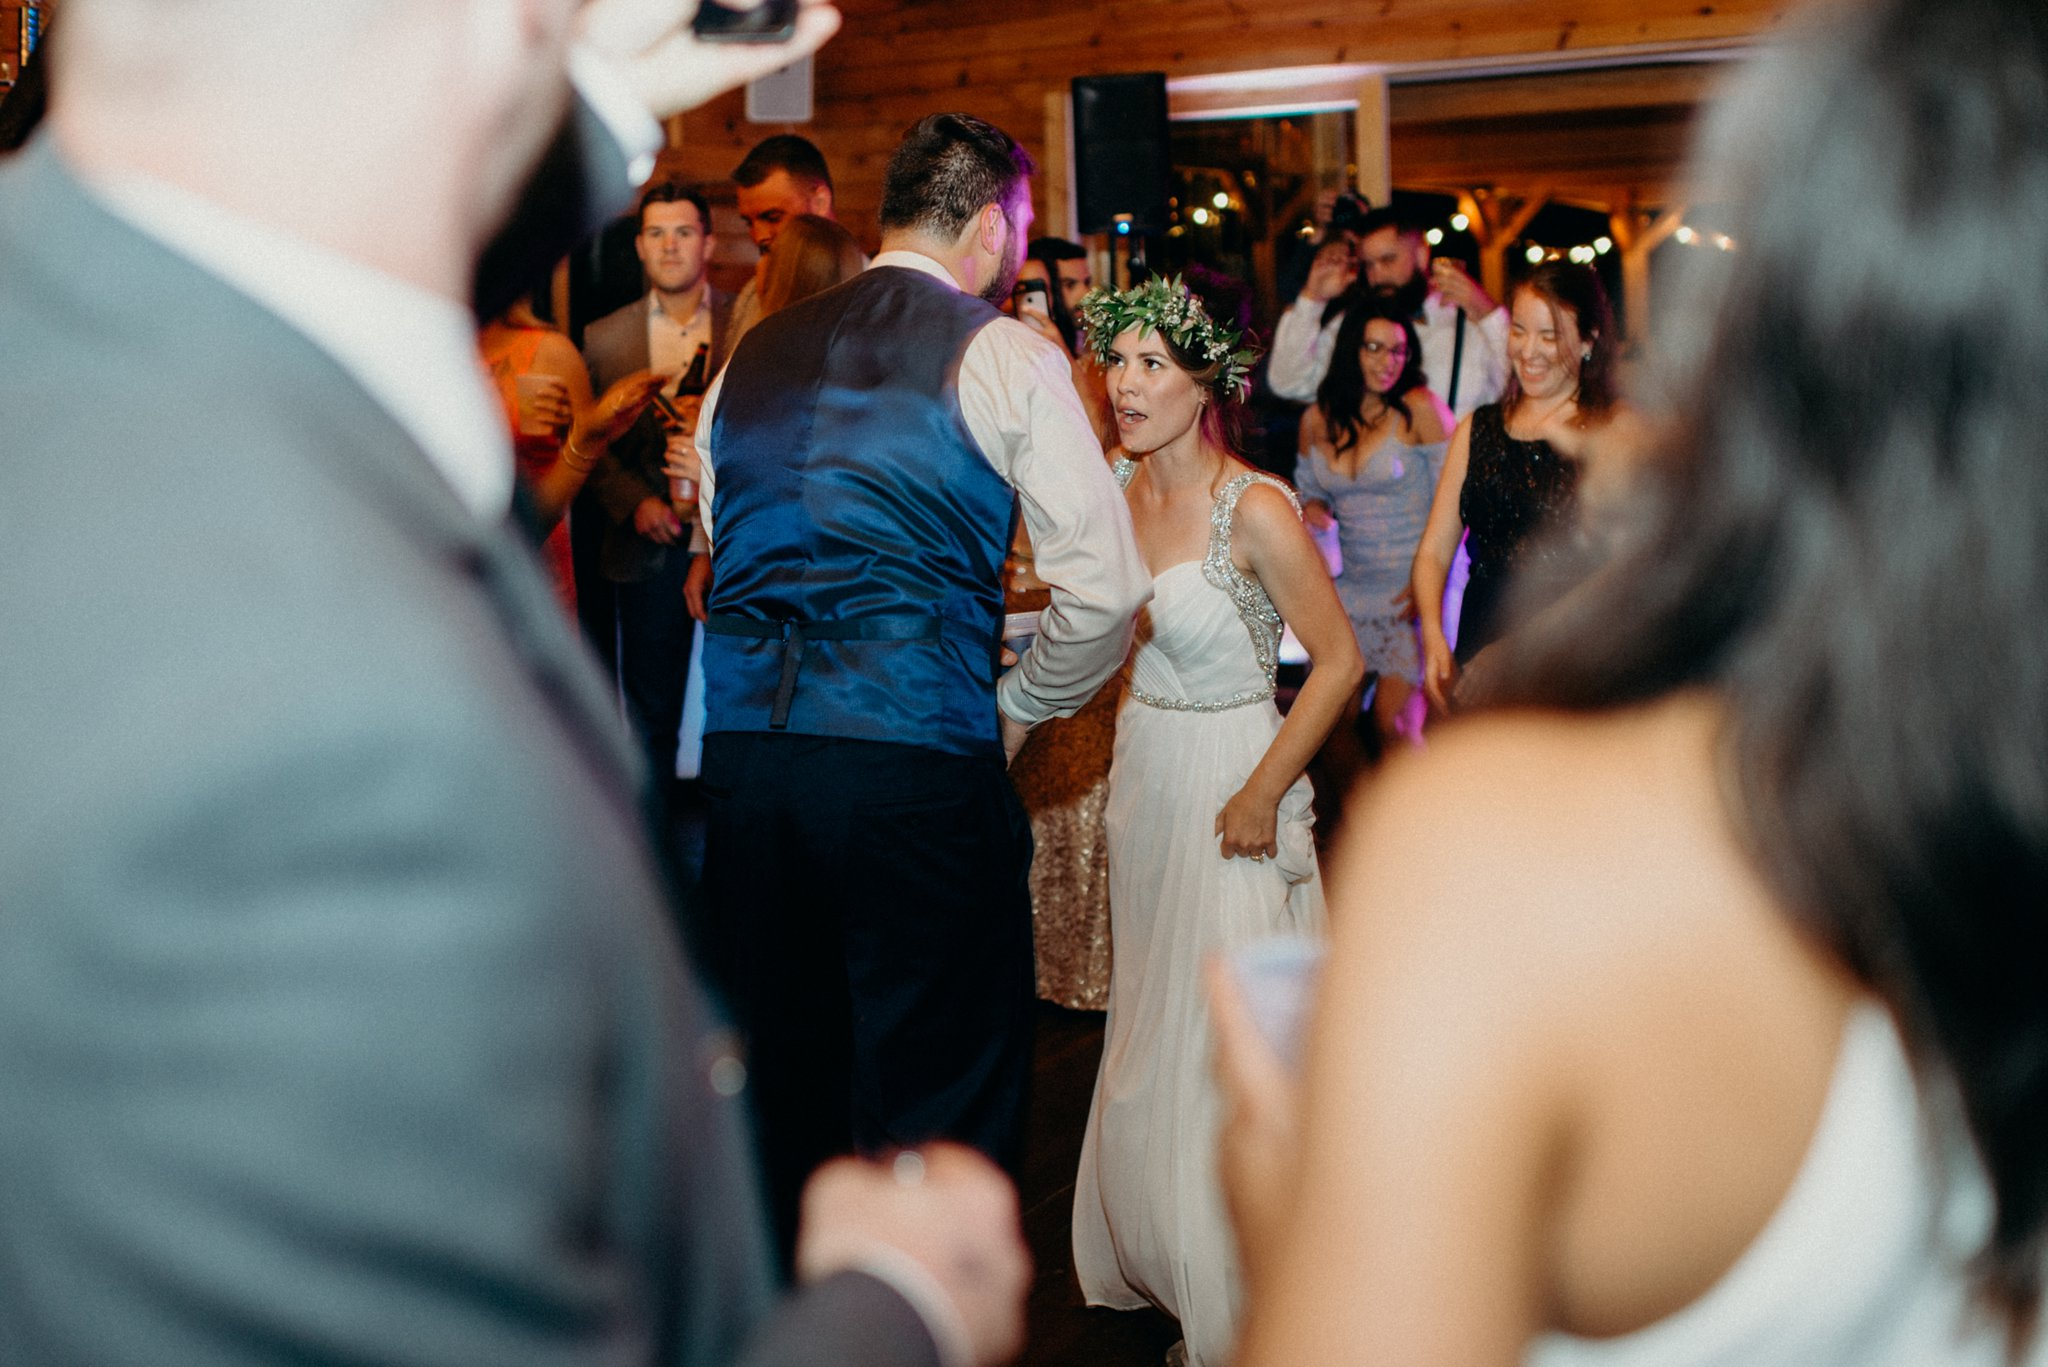 kaihla_tonai_intimate_wedding_elopement_photographer_6694.jpg